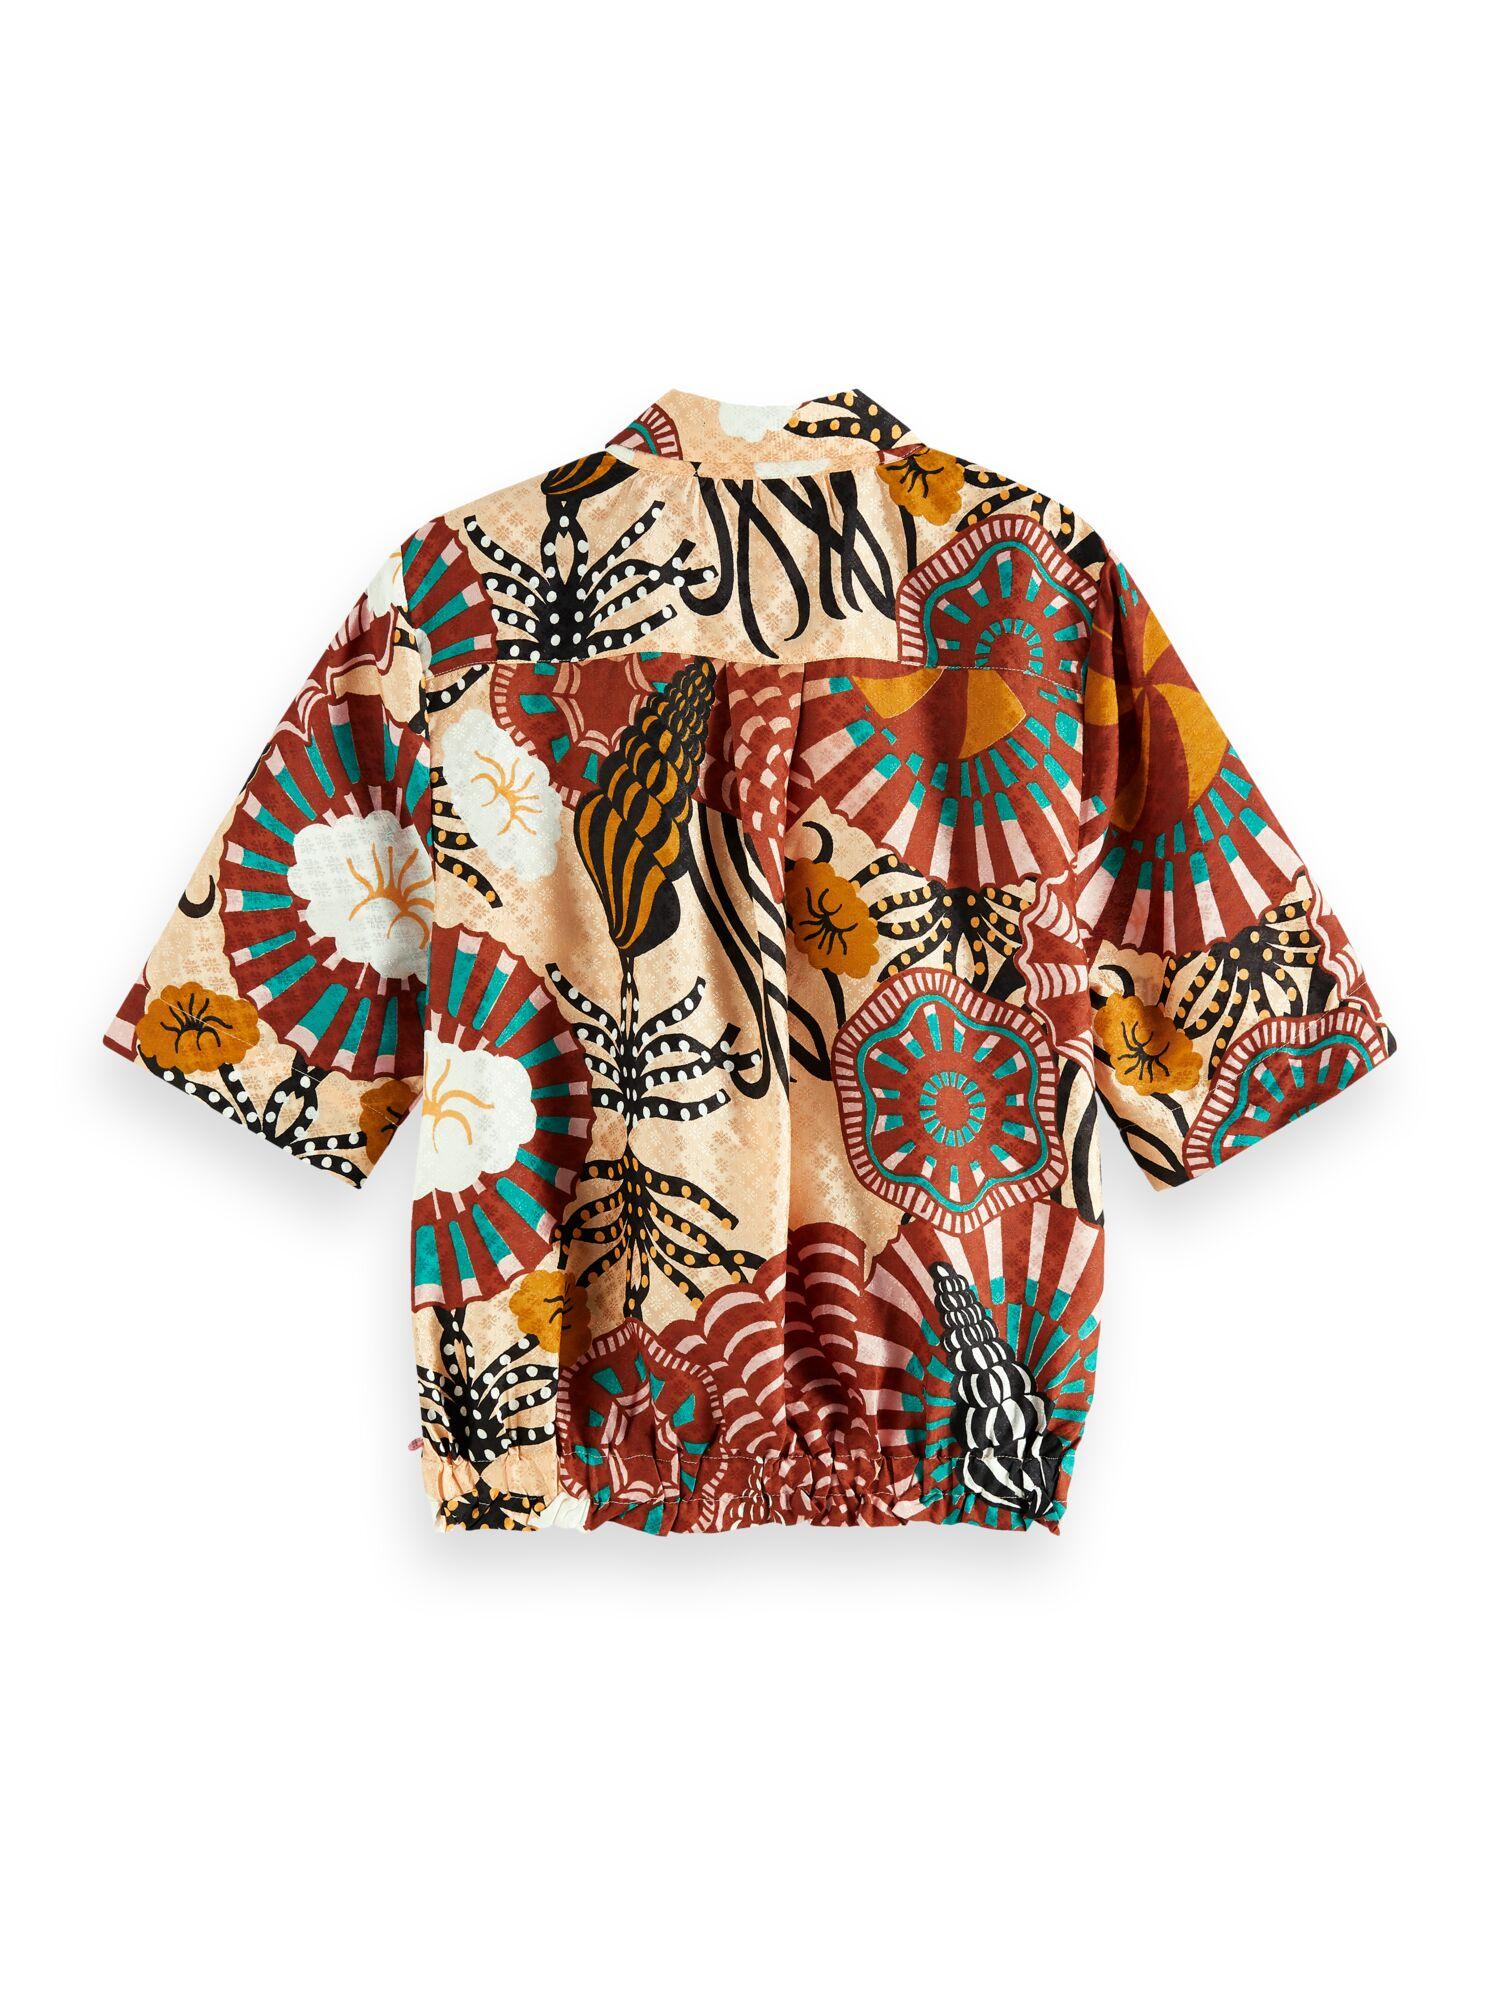 Scotch & Soda | Hawaii shirt in printed viscose jacquard